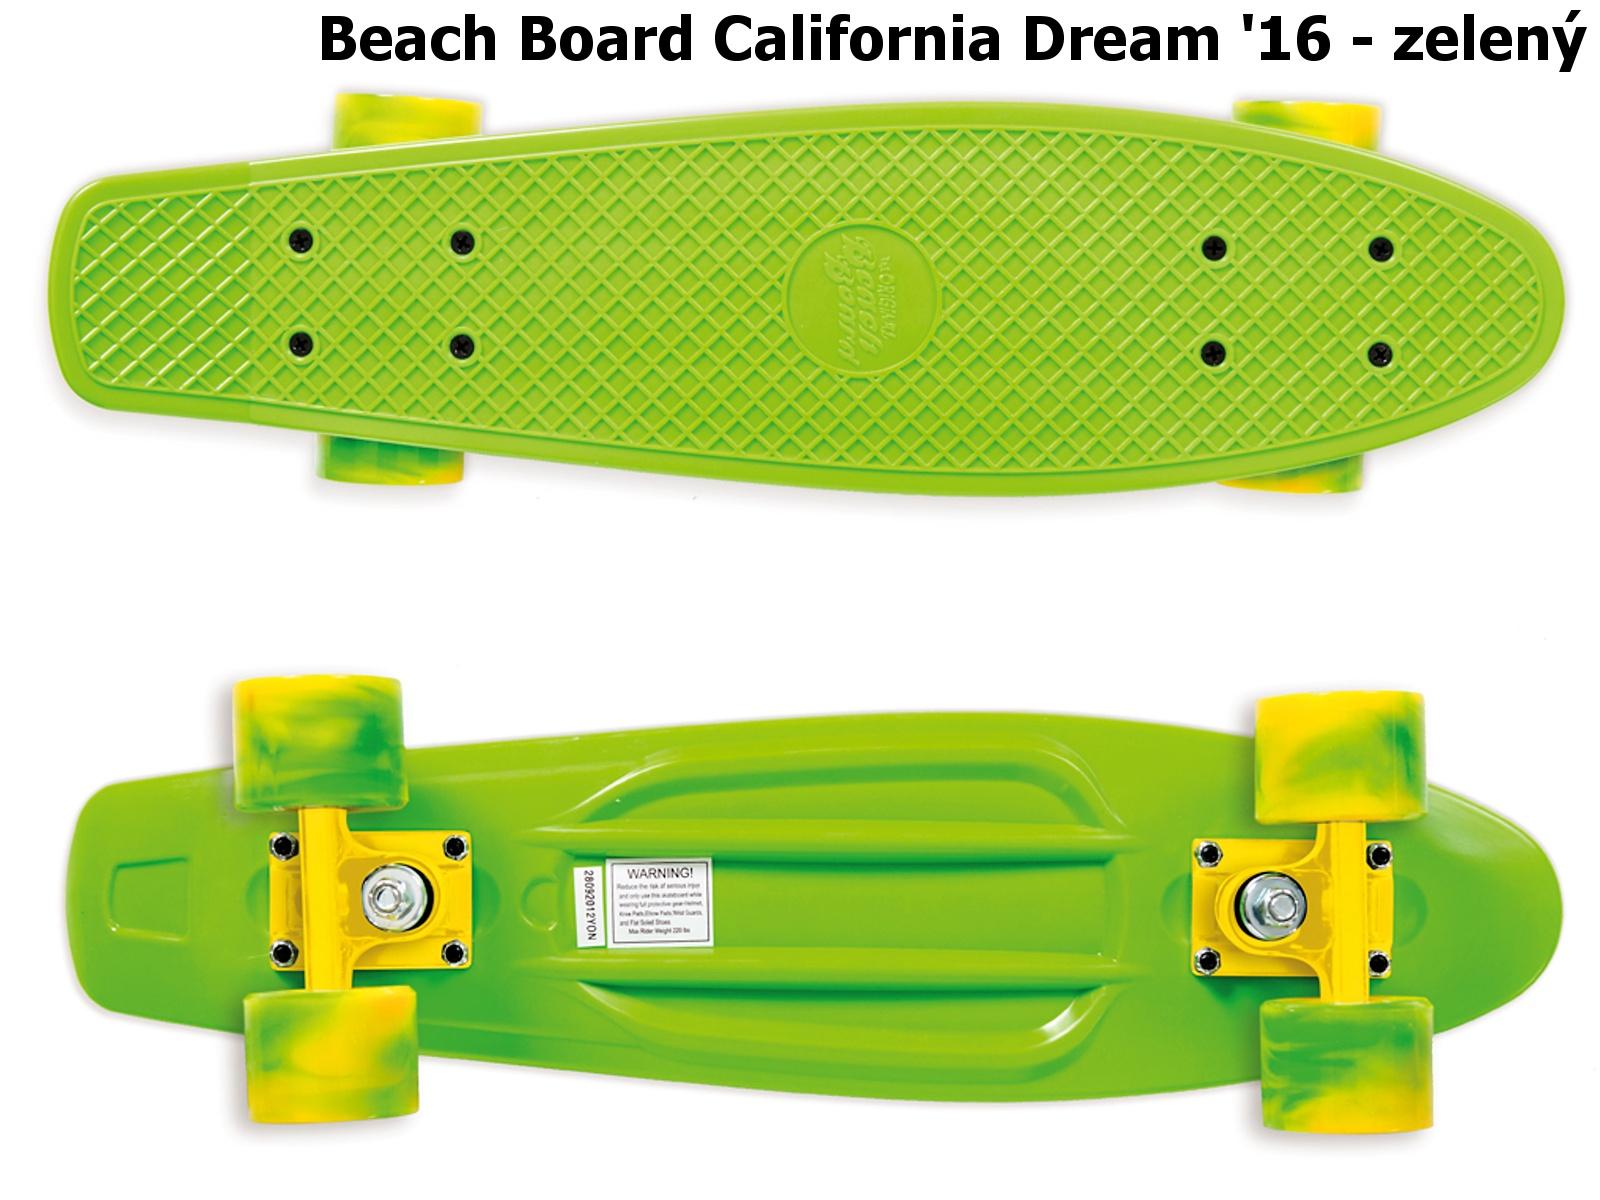 Skateboard STREET SURFING Beach Board California Dream - zelený